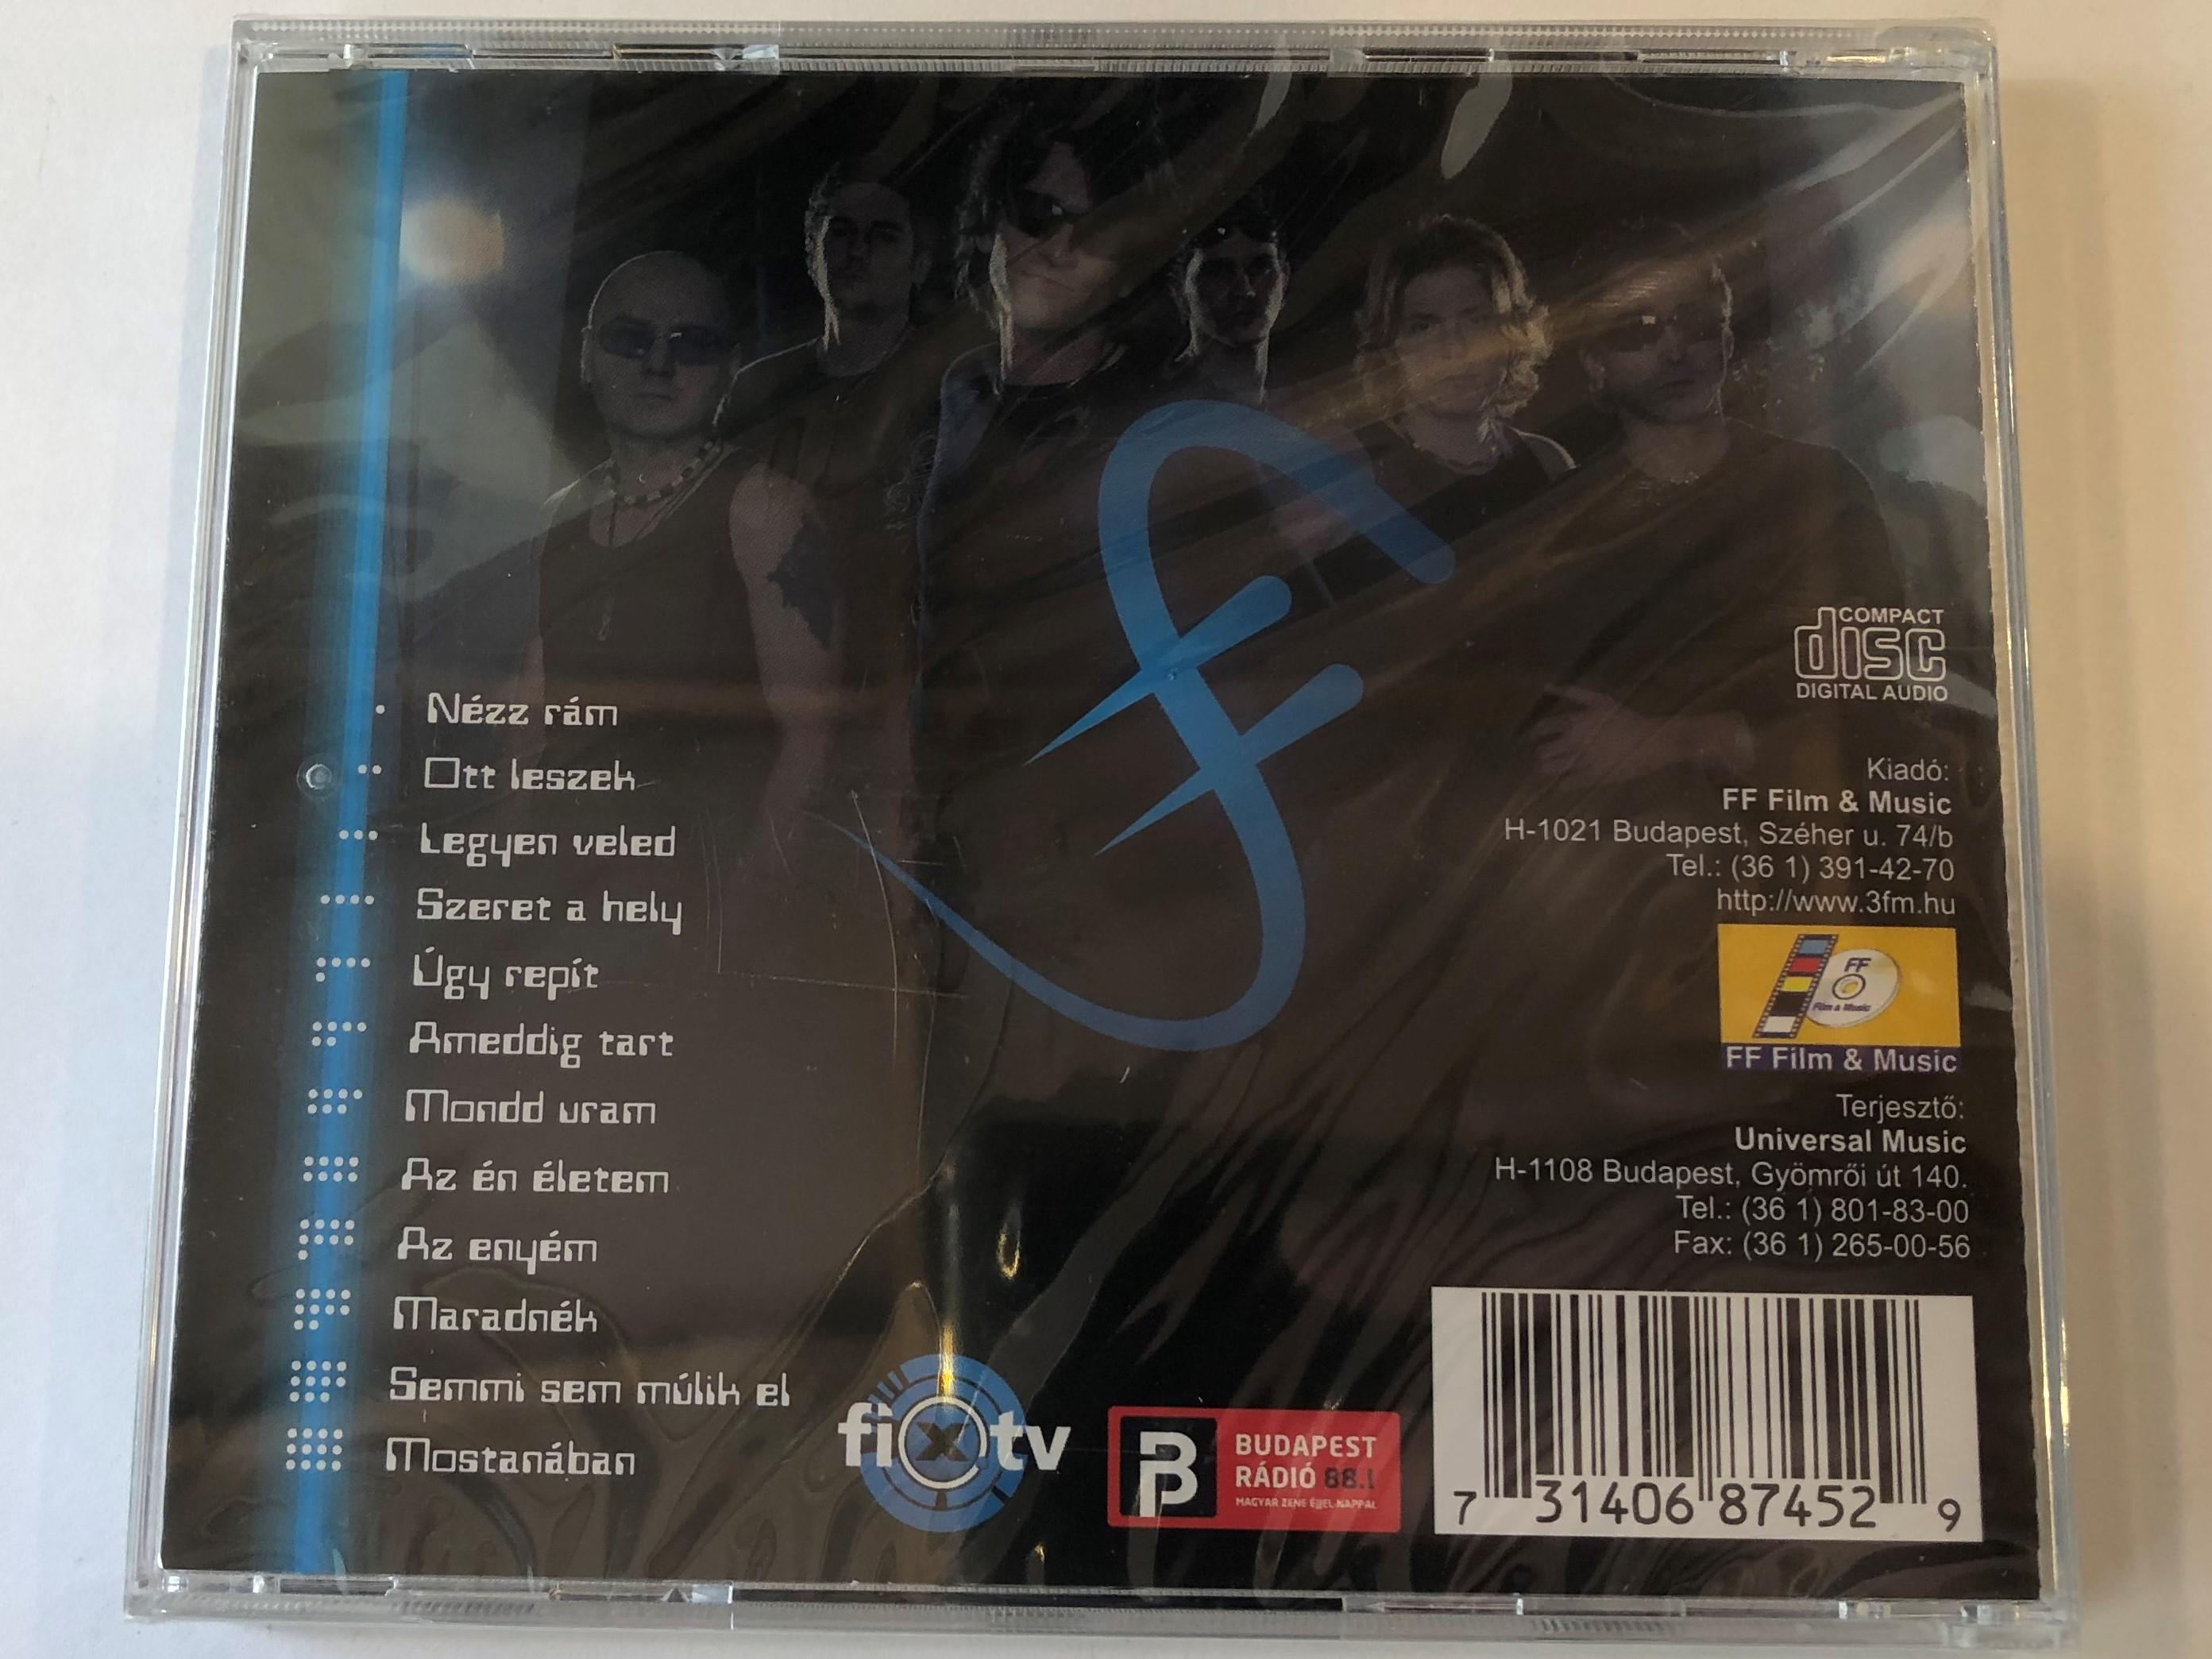 semmi-sem-m-lik-el-snake-heart-ff-film-music-audio-cd-731406874529-2-.jpg